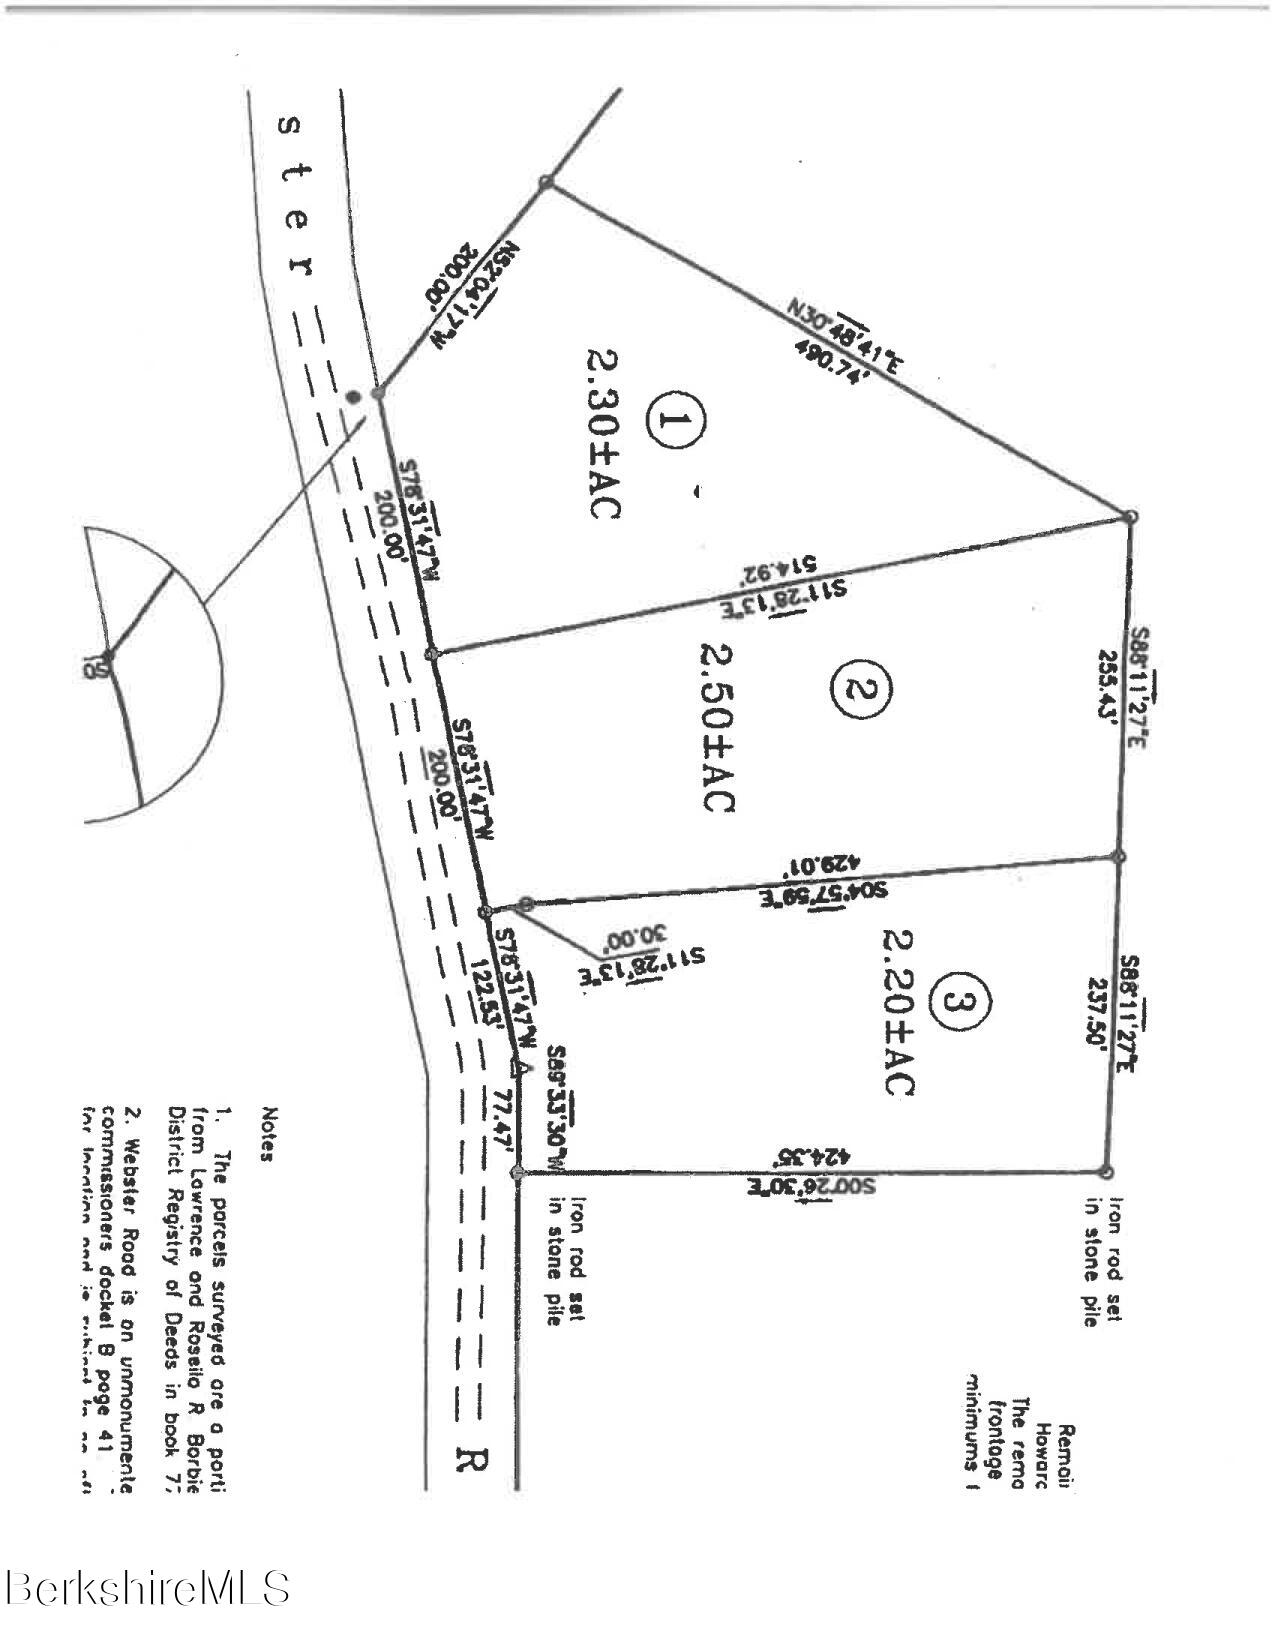 Lot 2 Webster Rd. Rd Tyringham MA 01264